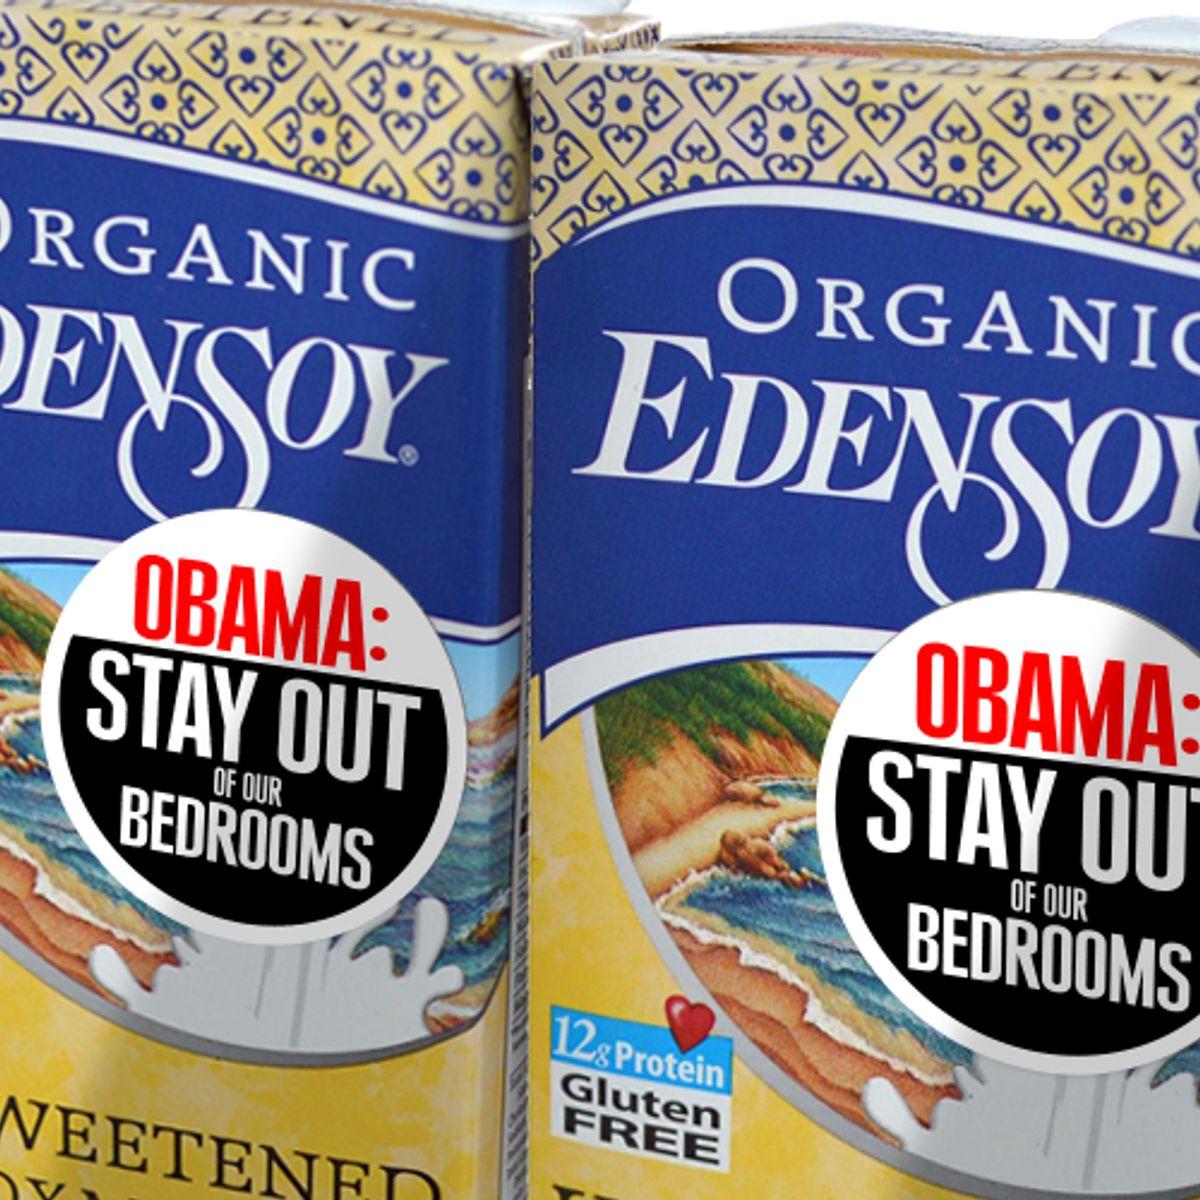 Eden Foods doubles down in birth